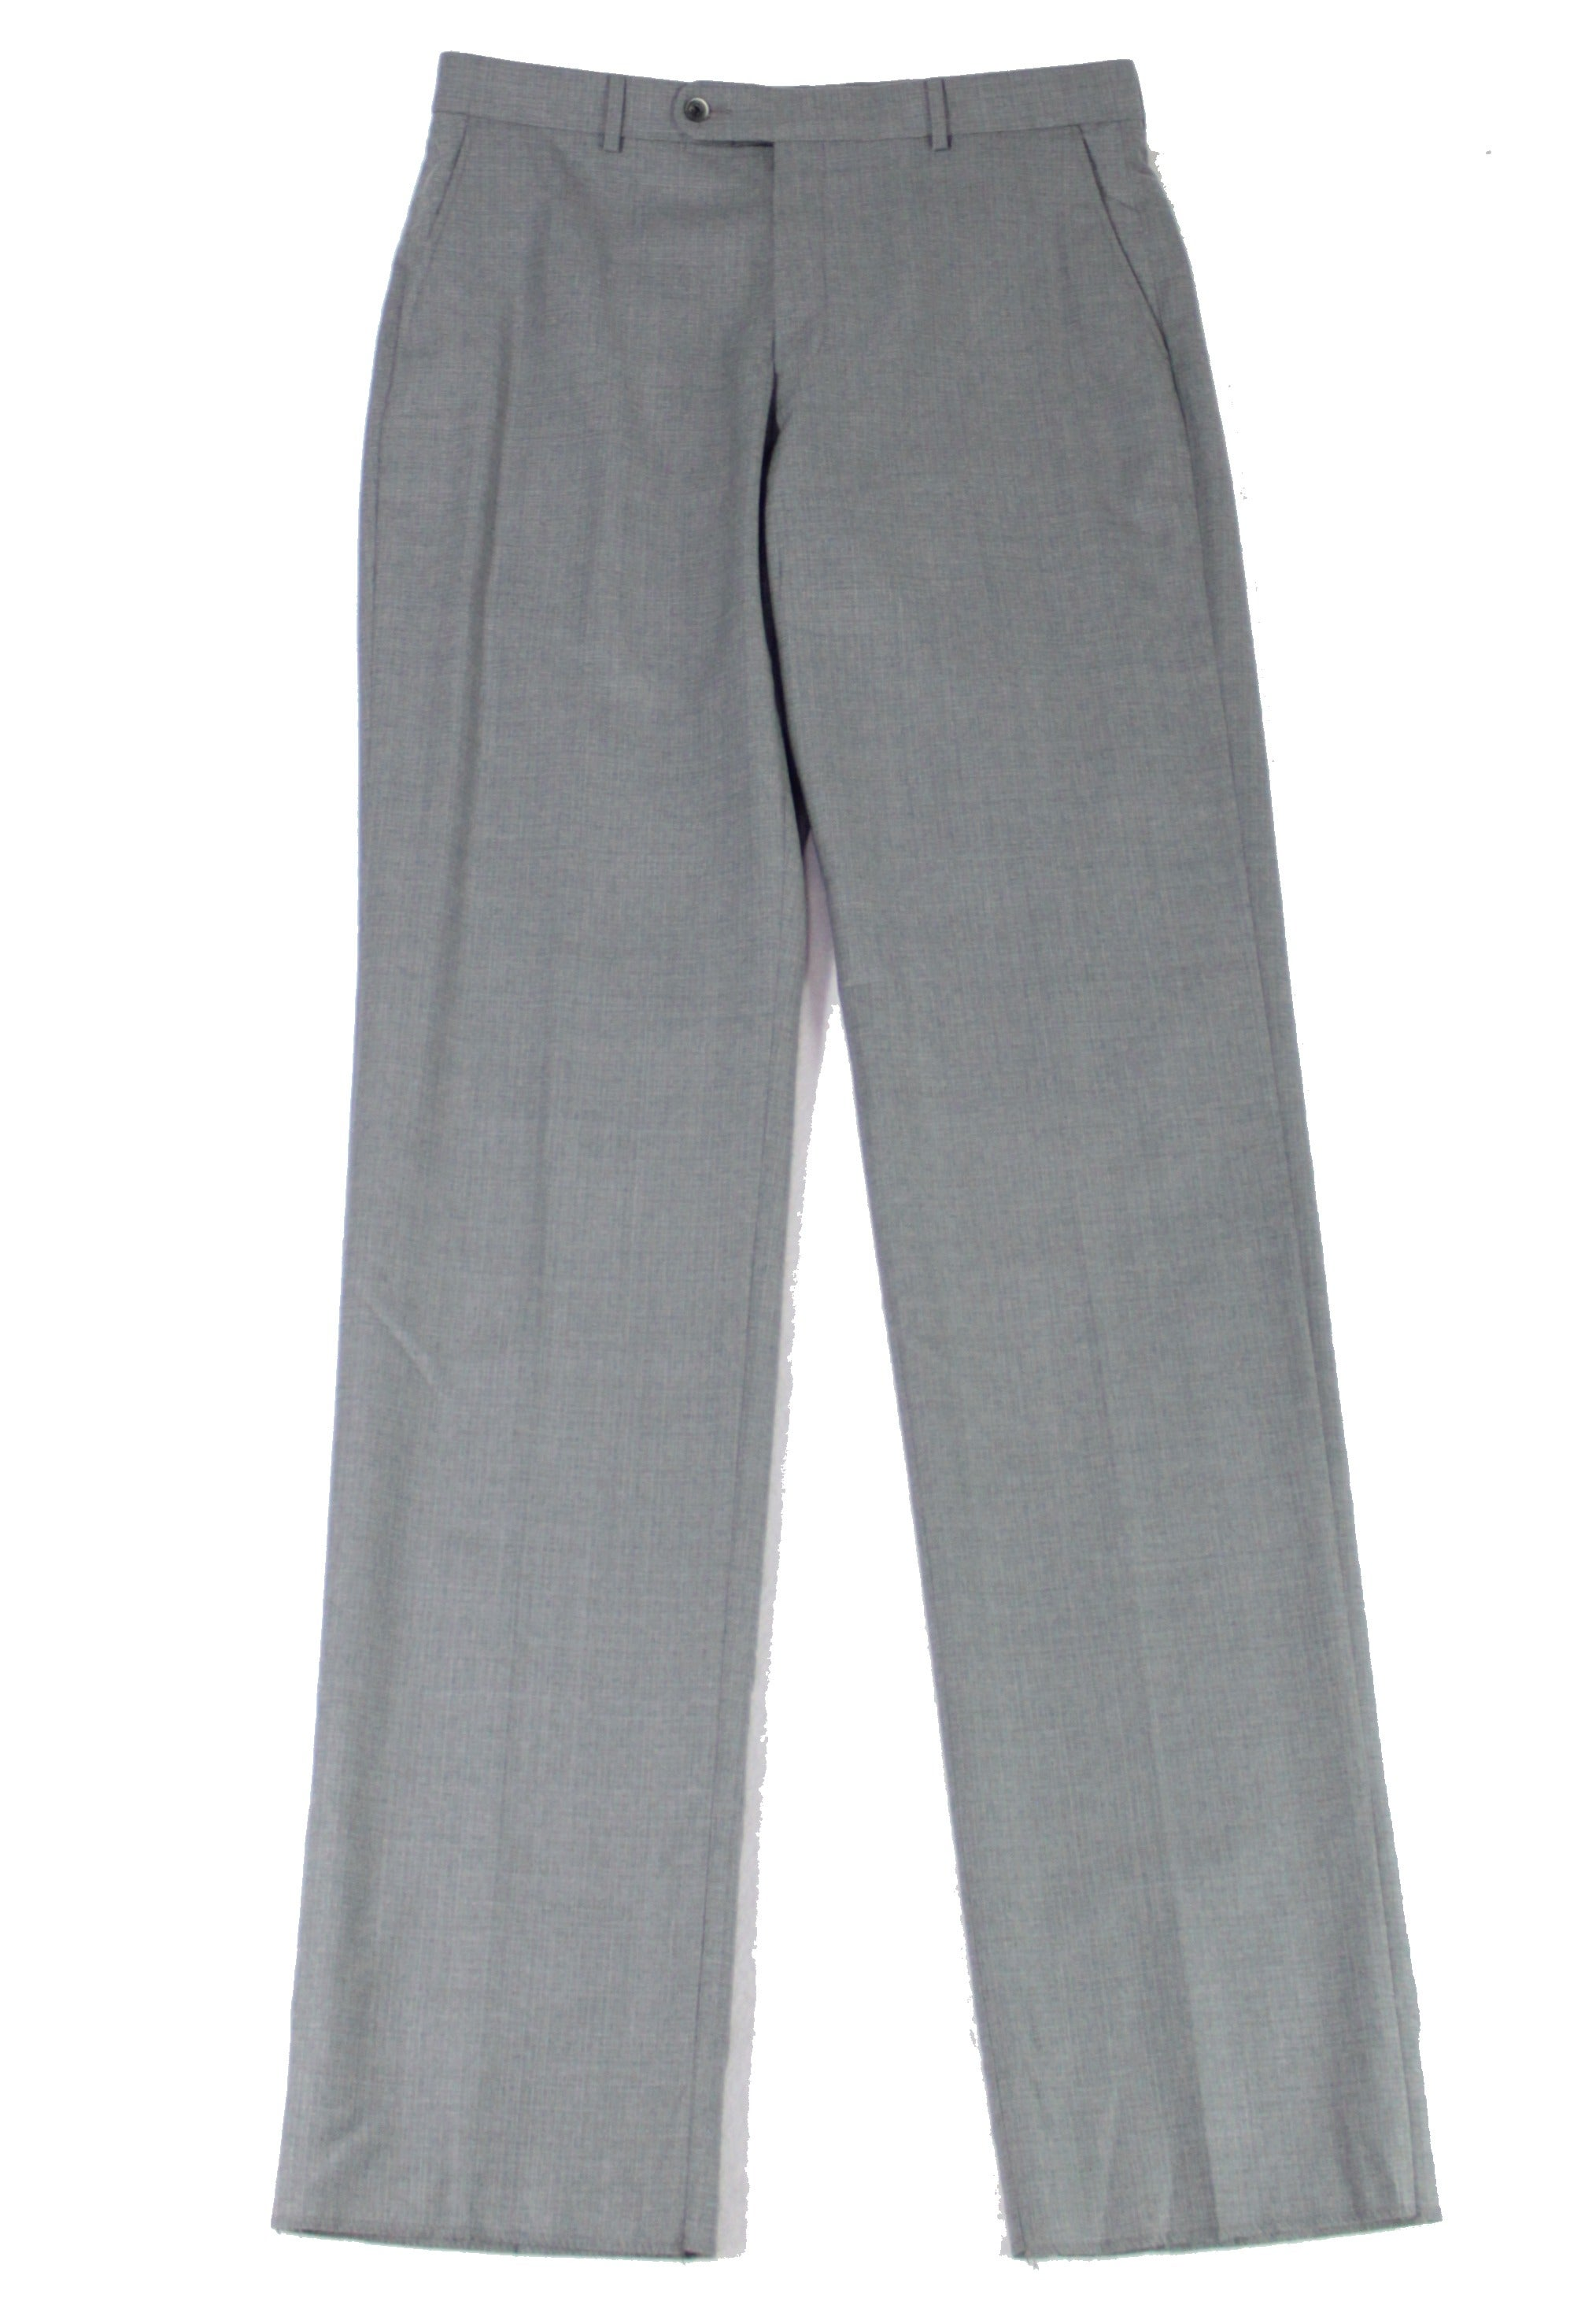 Ballin Mens Dress Pants Gray Size 34X38 Comfort Dunhill Wool Stretch